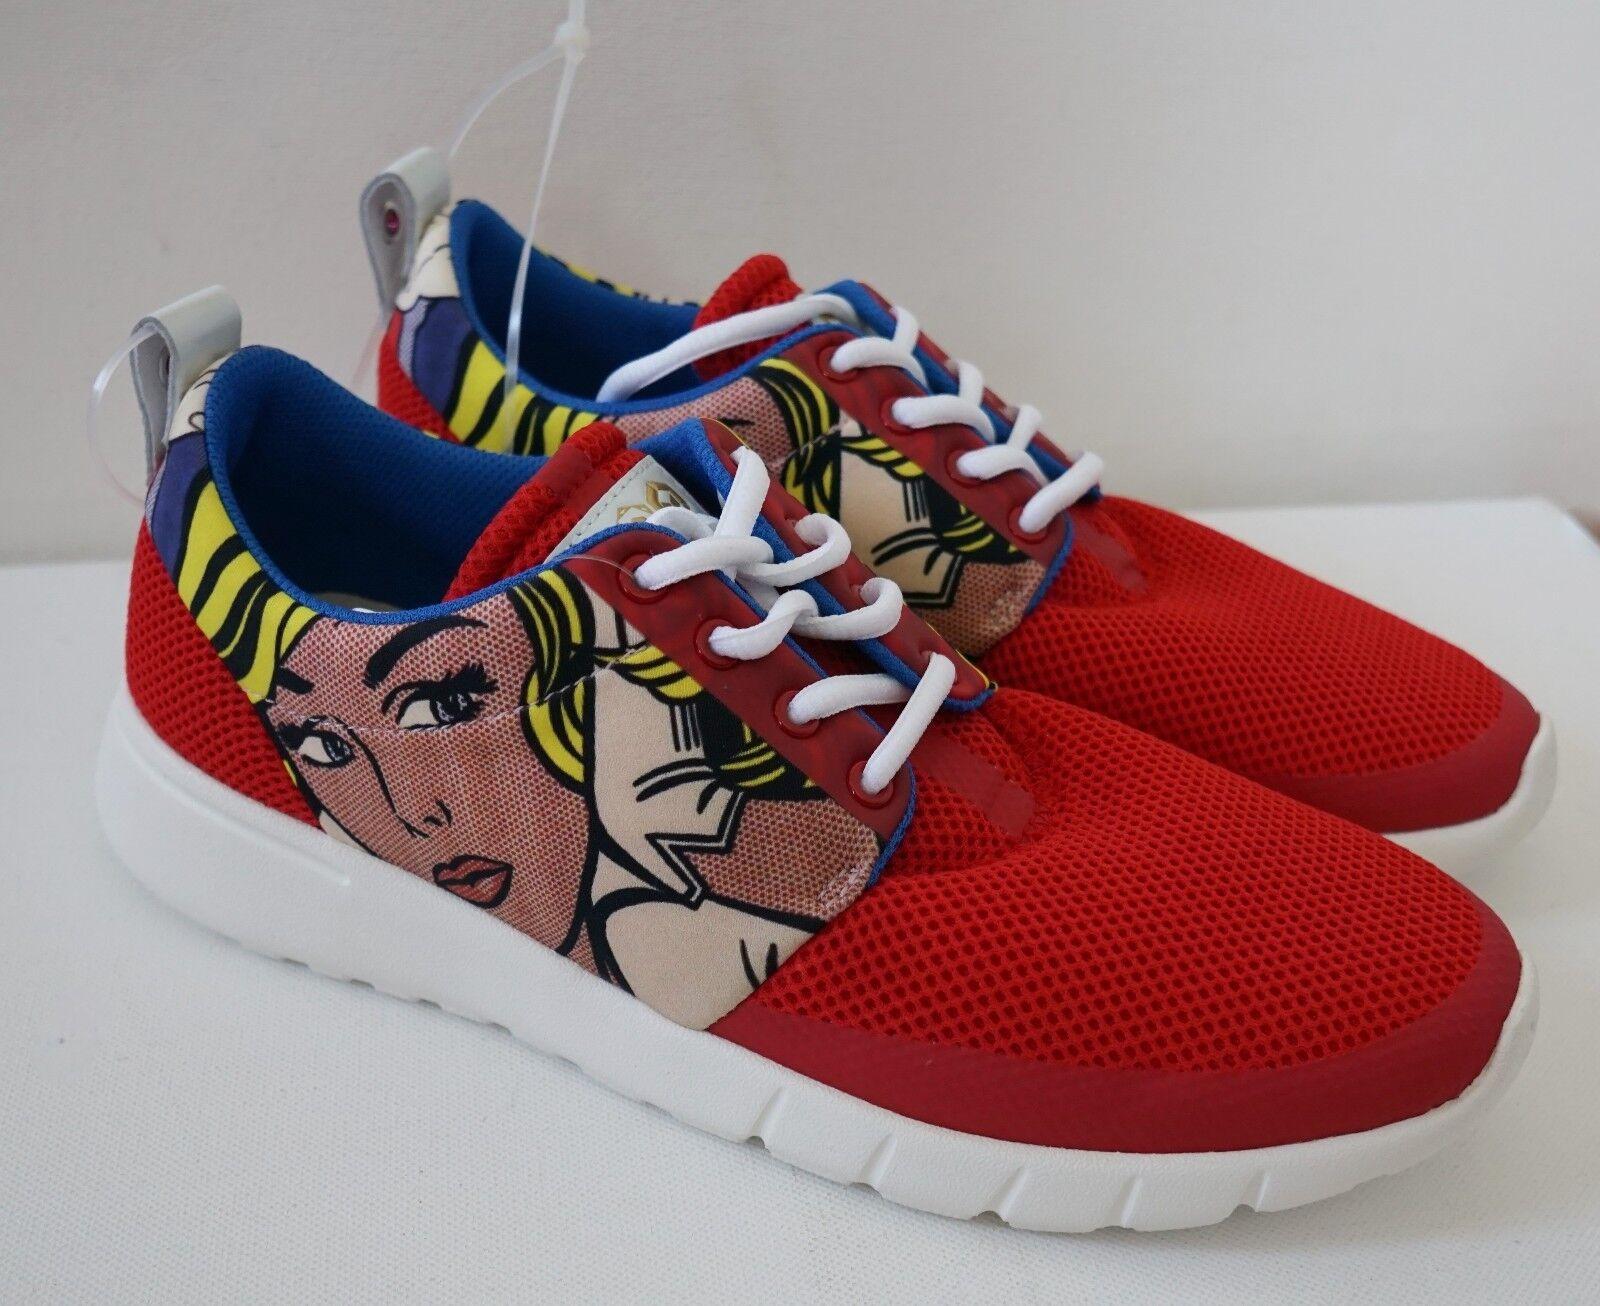 MOA MASTER OF ARTS Multi-Colored Fashion Scarpe da Ginnastica Scarpe EUR-40/US-7 EUR-41/US-8